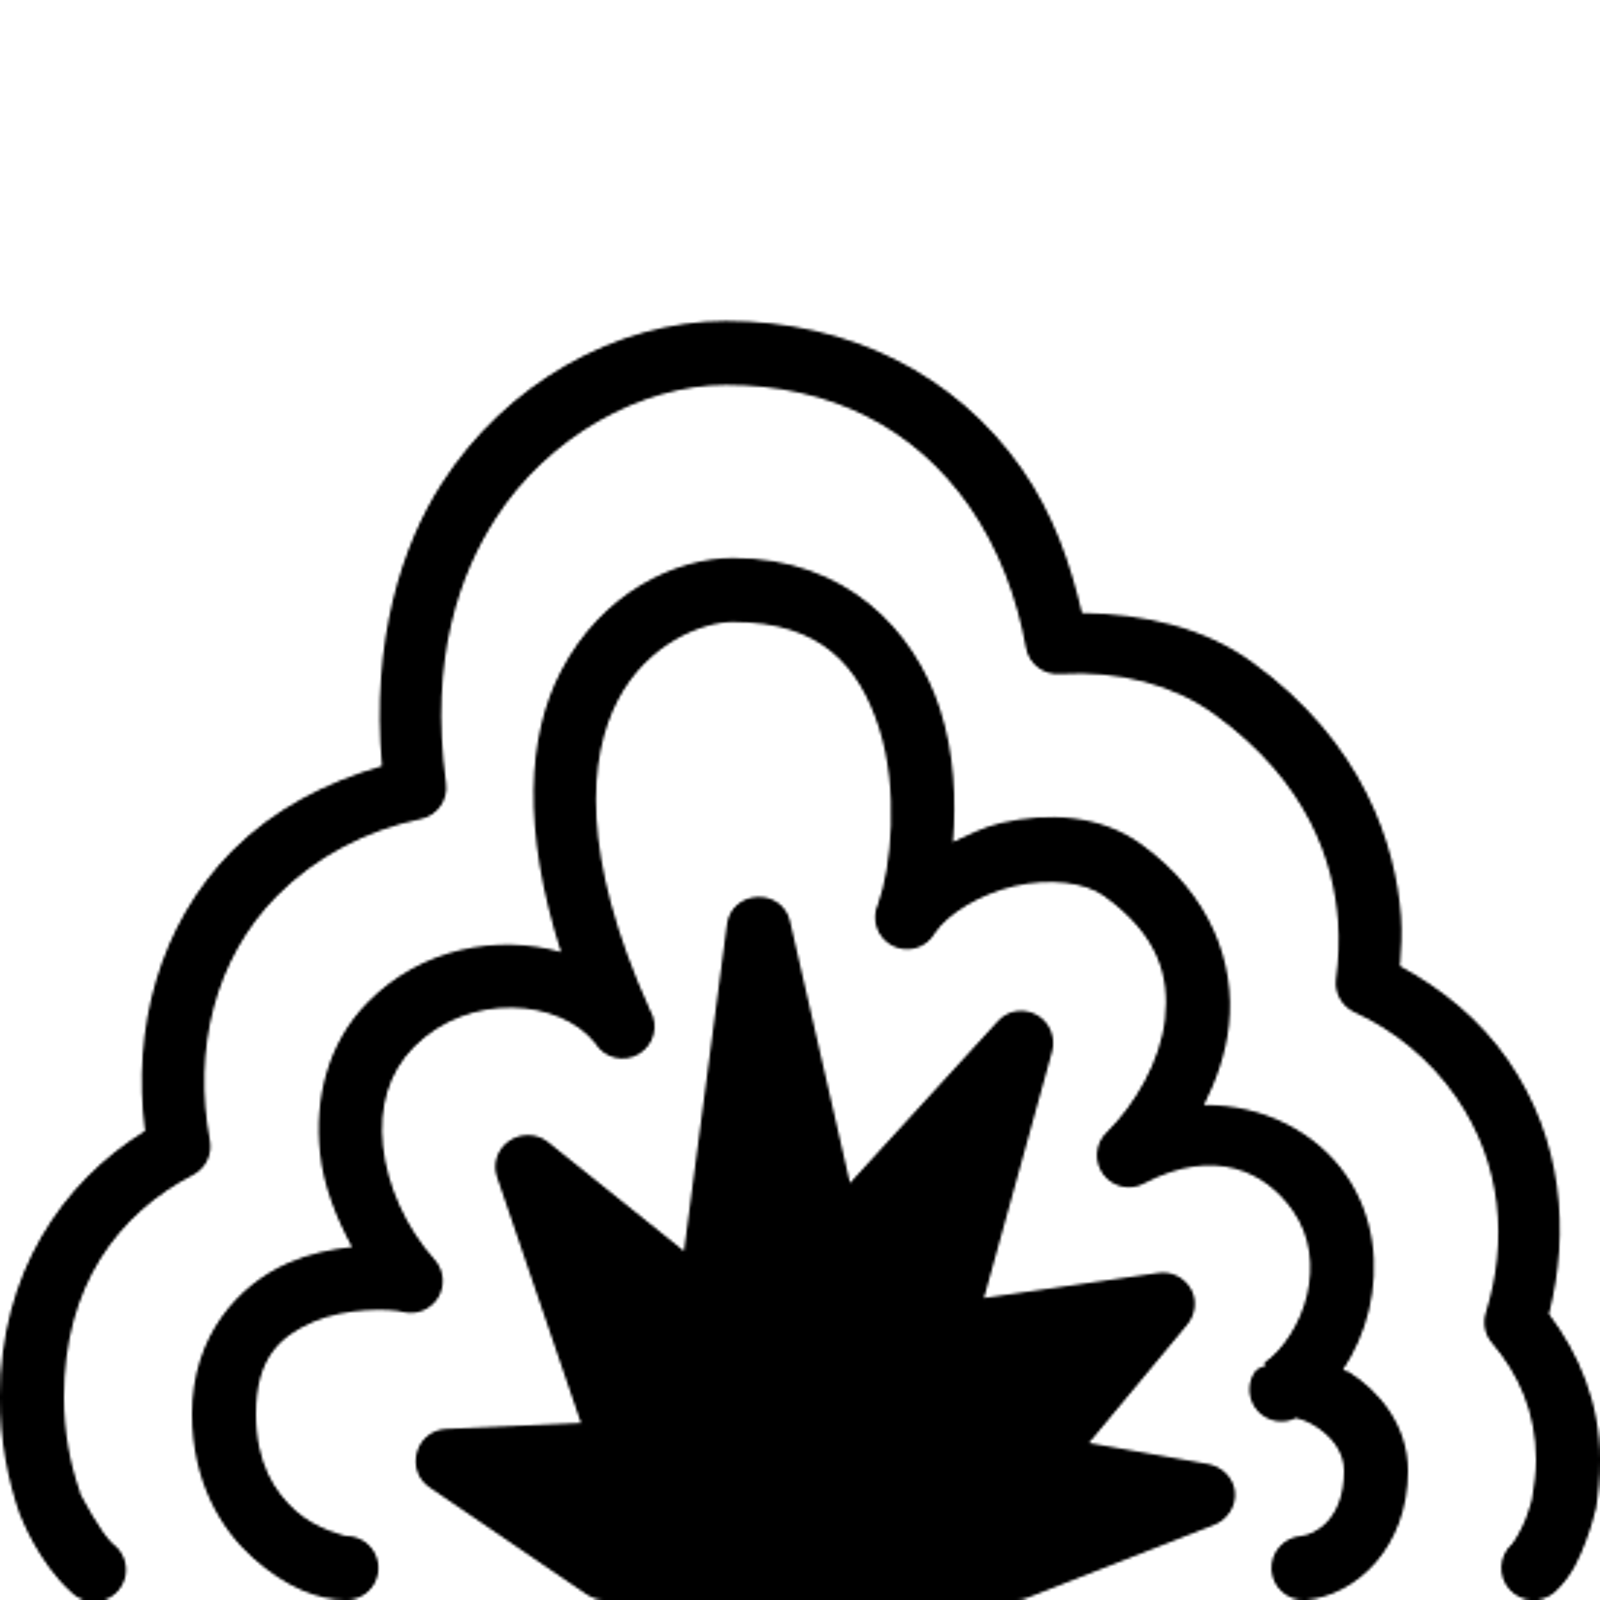 Smoke Filled icon